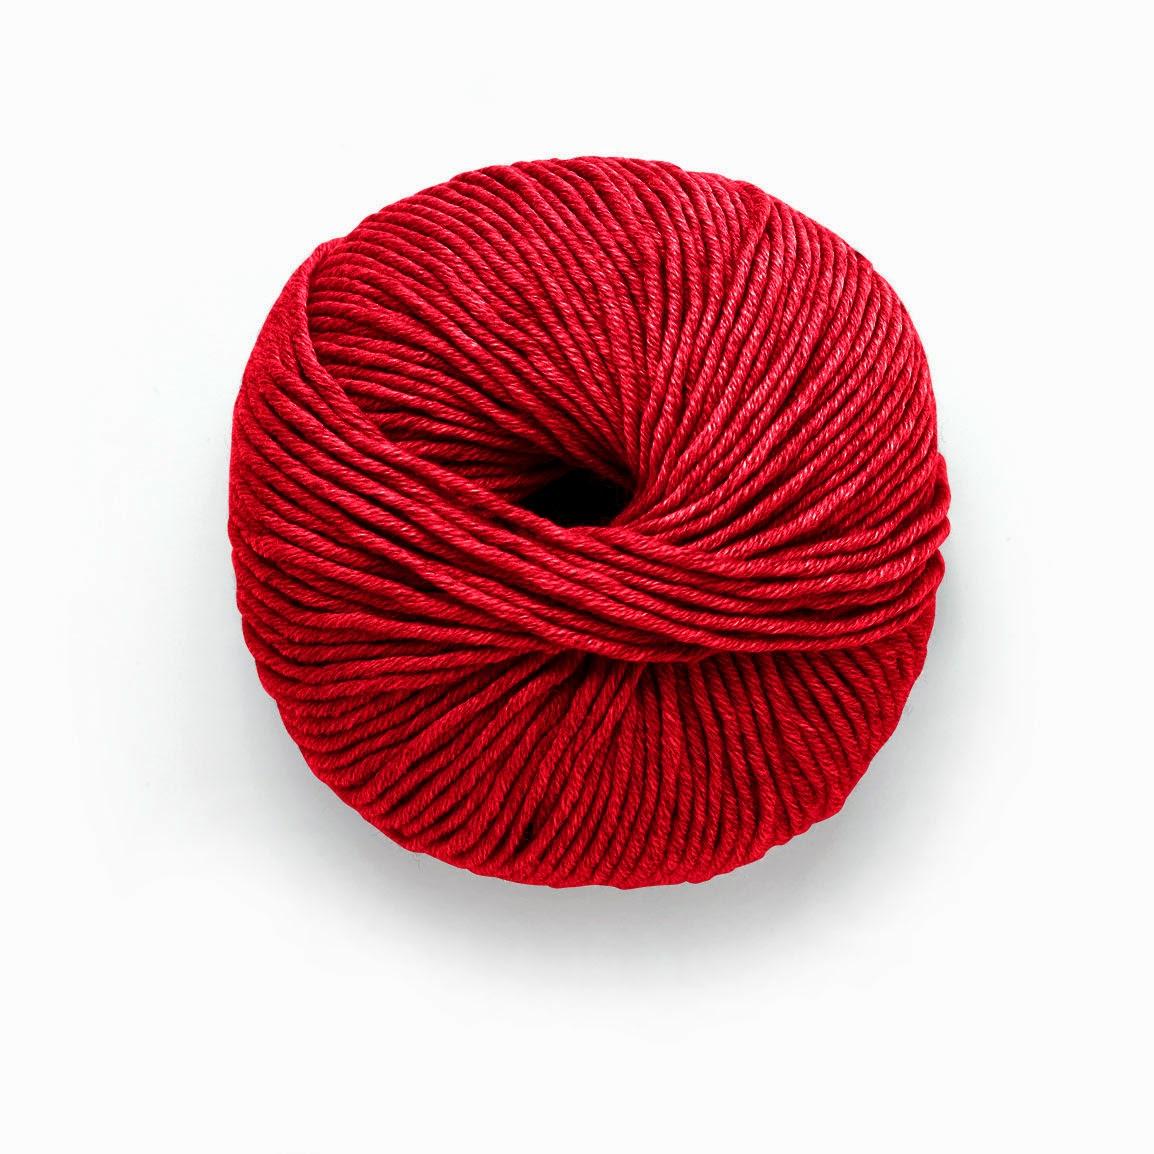 http://millamia.com/yarn.php?type=Aran&range=brights&id=38